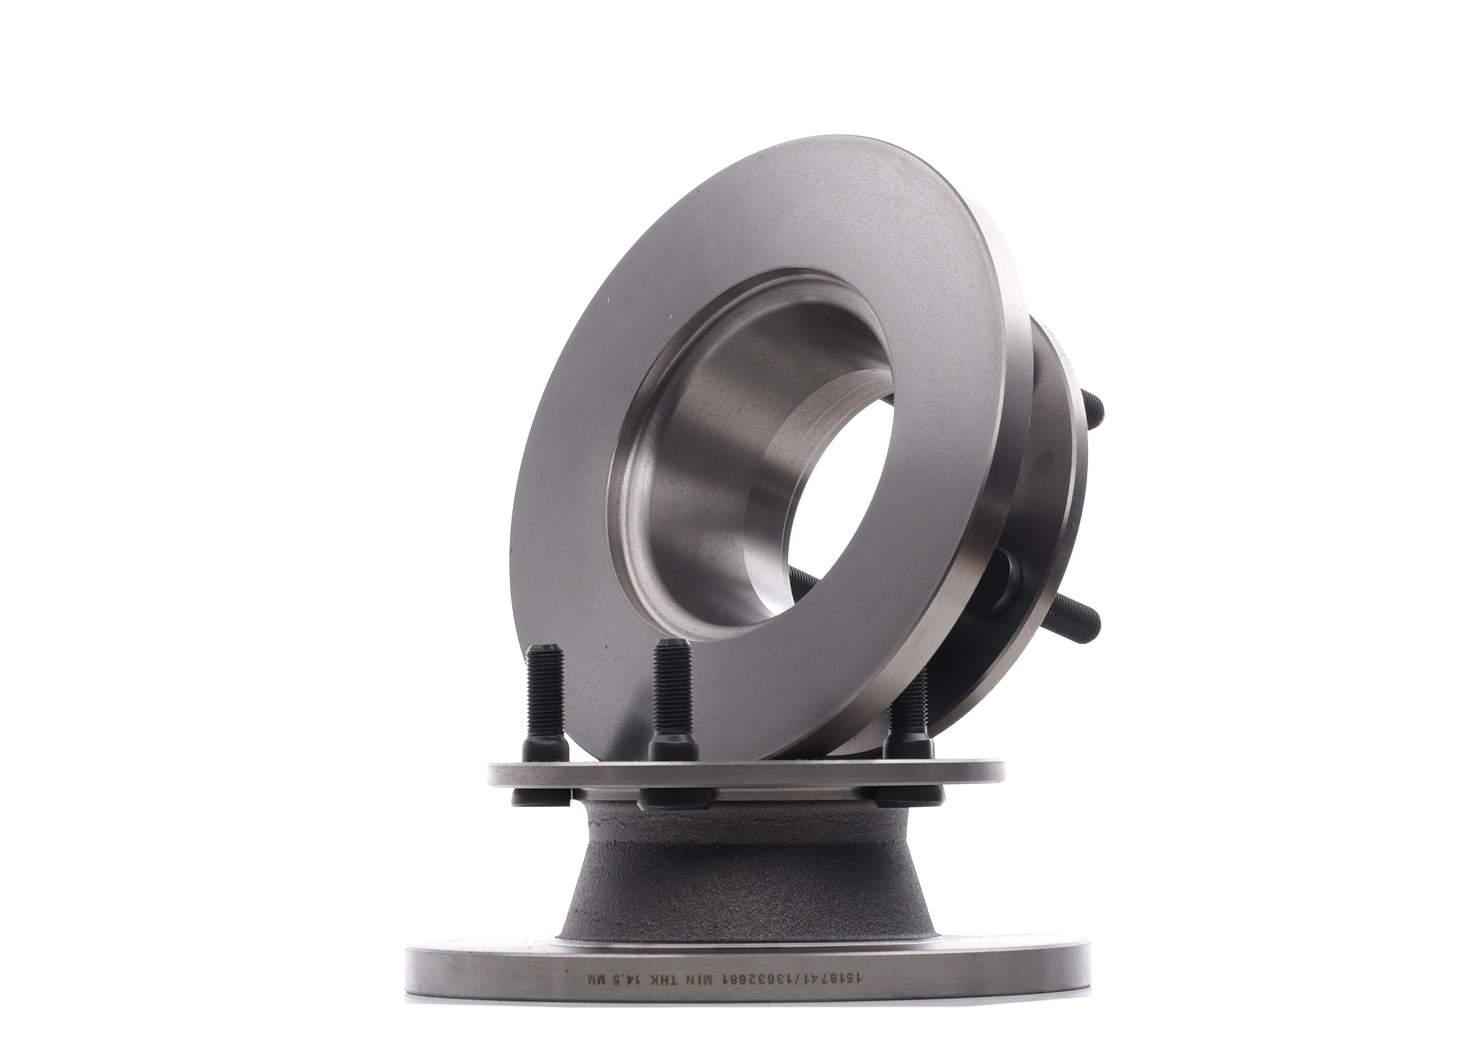 MERCEDES-BENZ MB 100 2020 Tuning - Original RIDEX 82B1346 Ø: 239mm, Bremsscheibendicke: 16mm